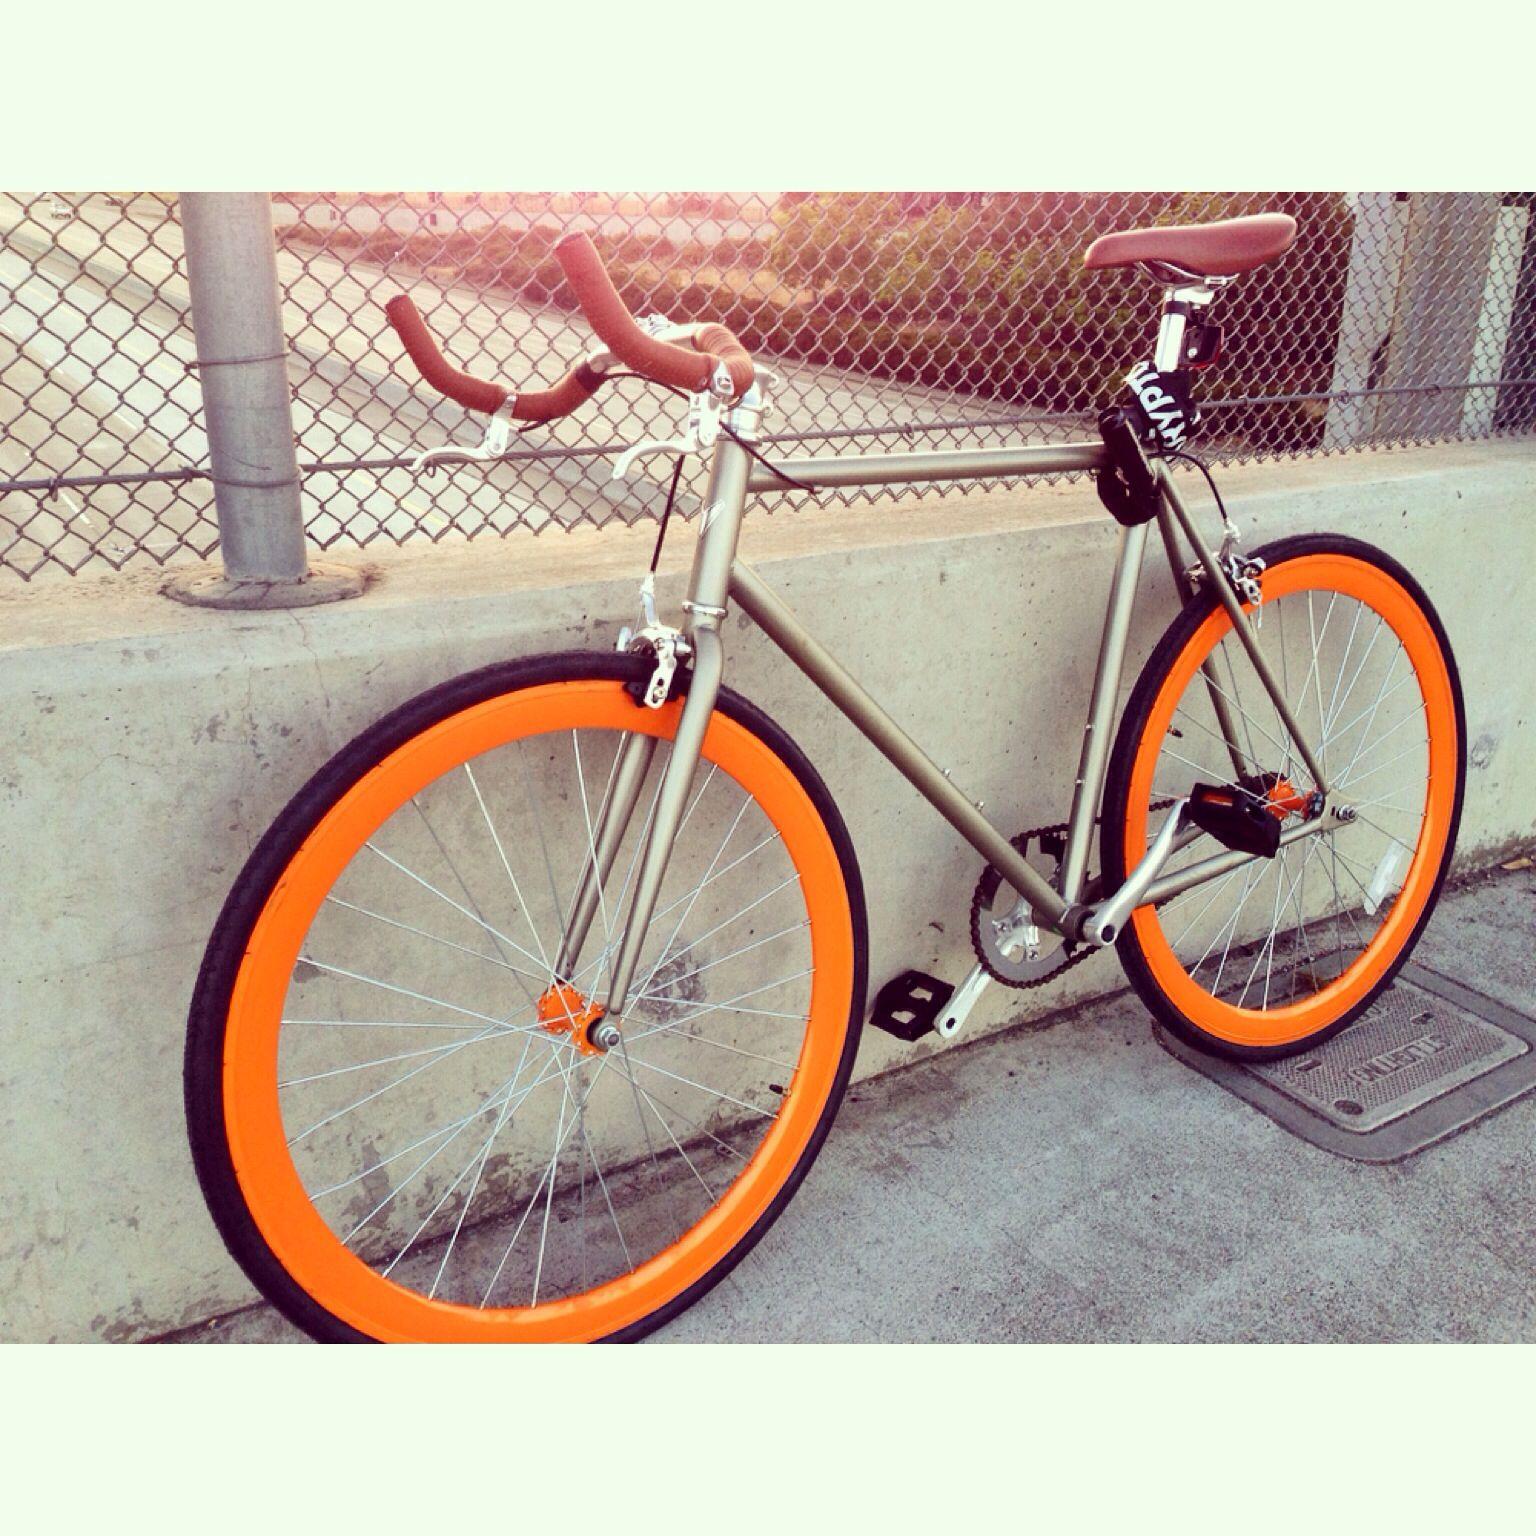 Fresh New Bike With Pursuit Bullhorn Handlebars Bicicleta Ciclovia